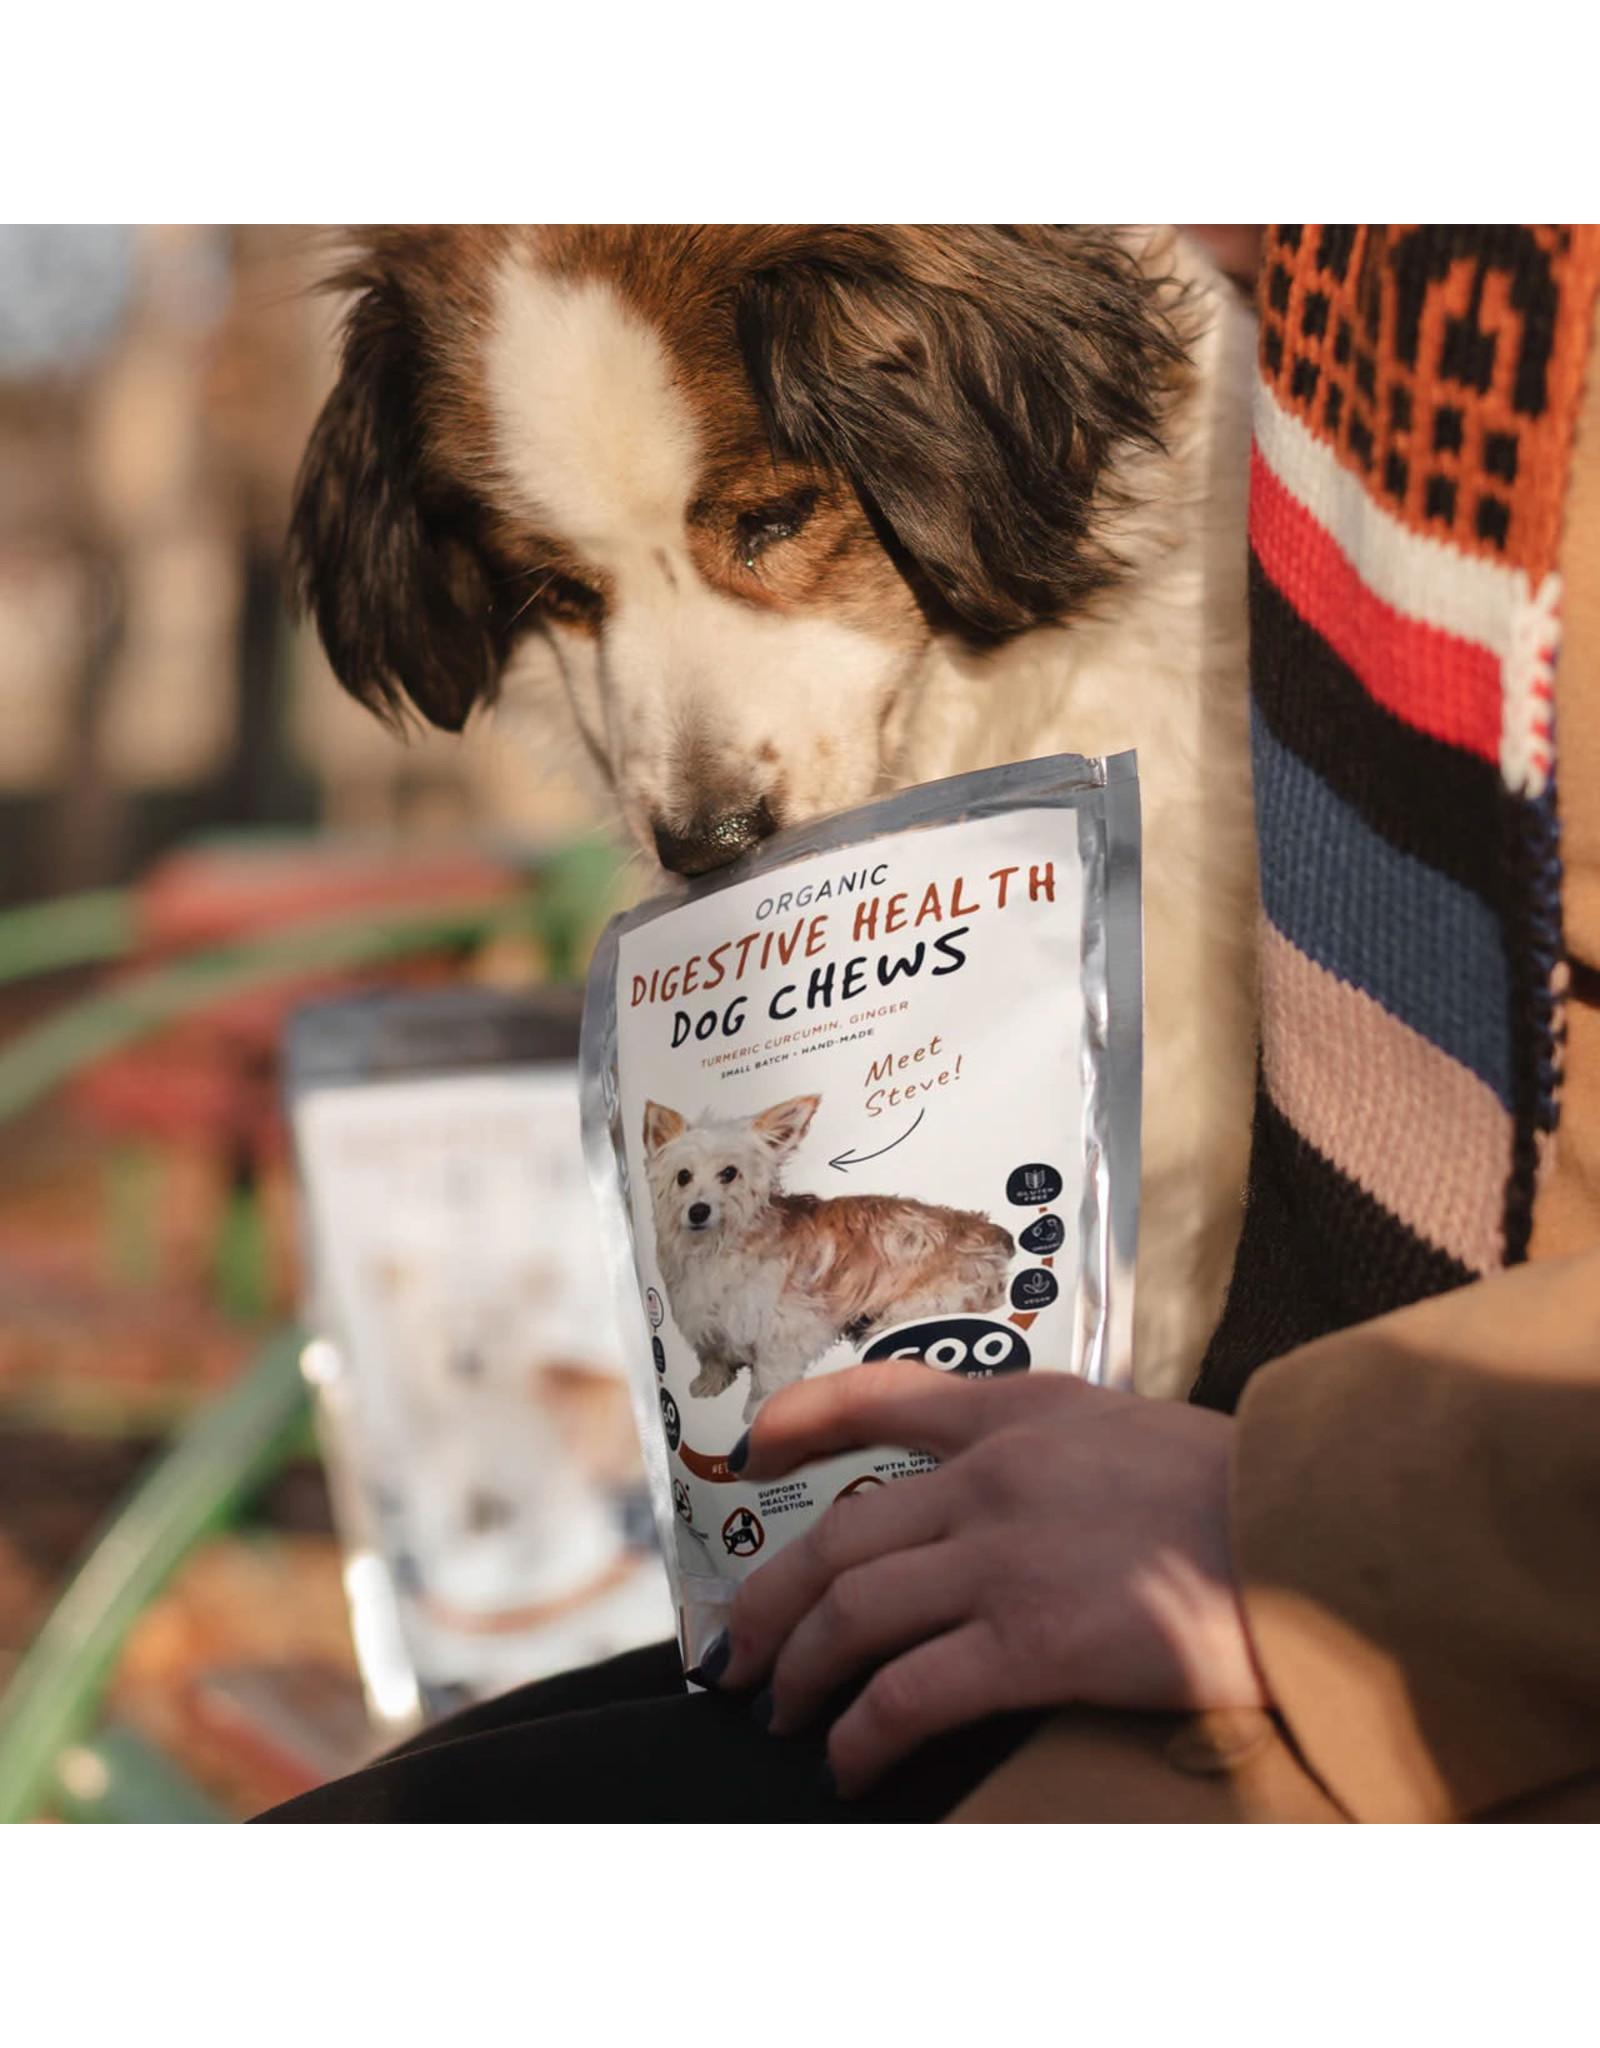 Neurogan Neurogan Non CBD Digestive Health Dog Chews 500mg 60ct